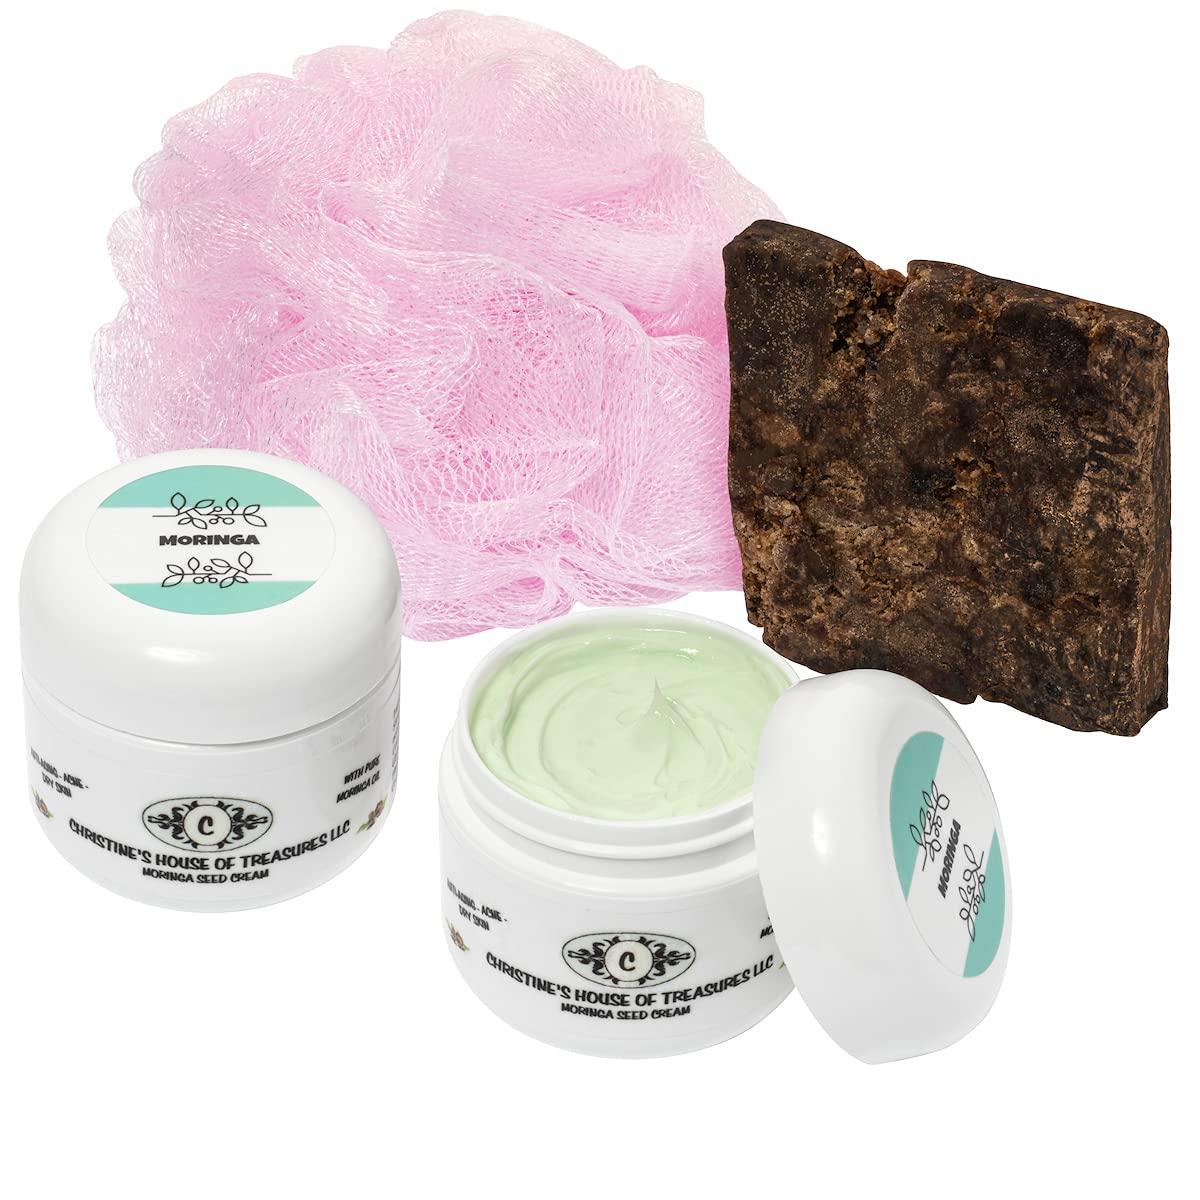 Moringa Oleifera Cream Set of Two; Branded goods Anti Aging Face P Best Cream; Long Beach Mall